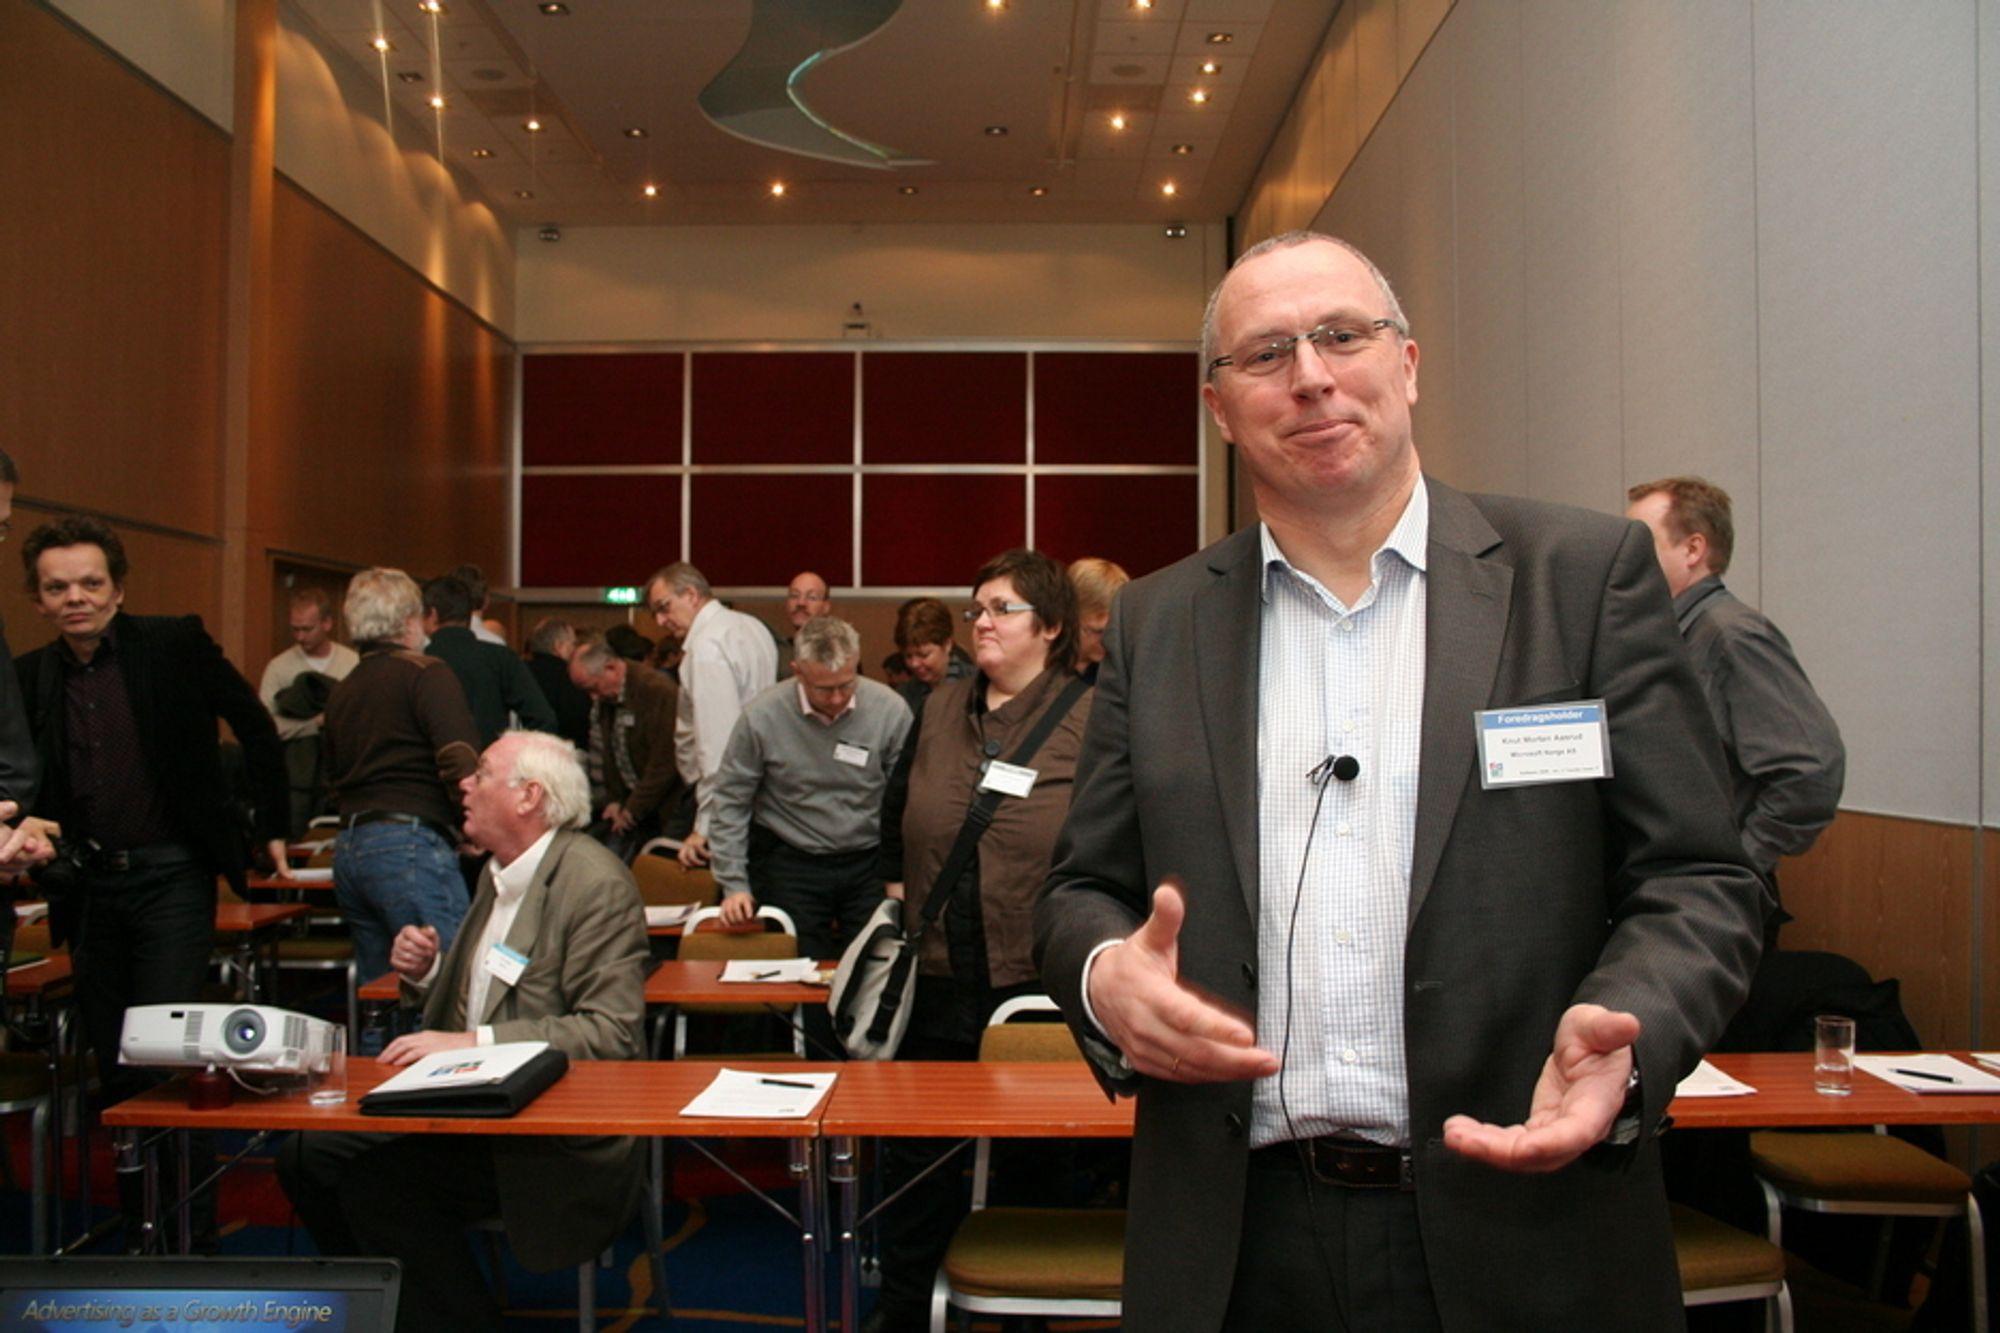 Adm. dir. Knut Morten Aasrud, Microsft Norge, på Software 2008, SAS Radisson Oslo